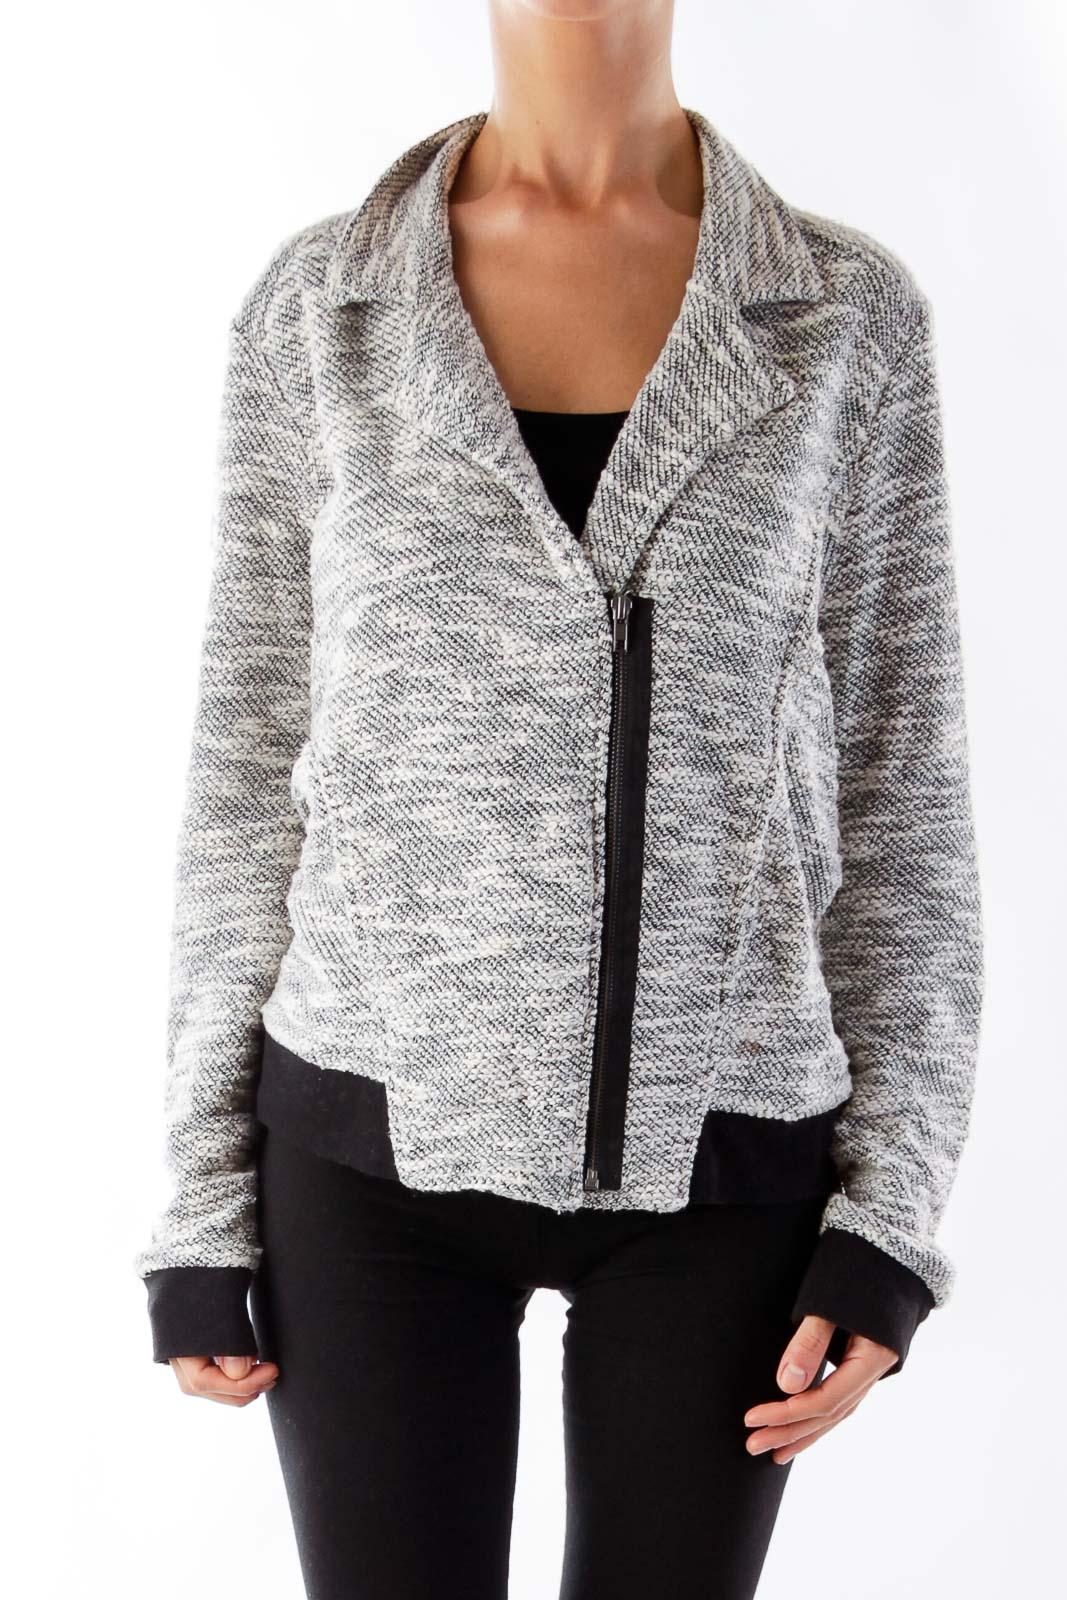 Black & Withe Zipper Jacket Front